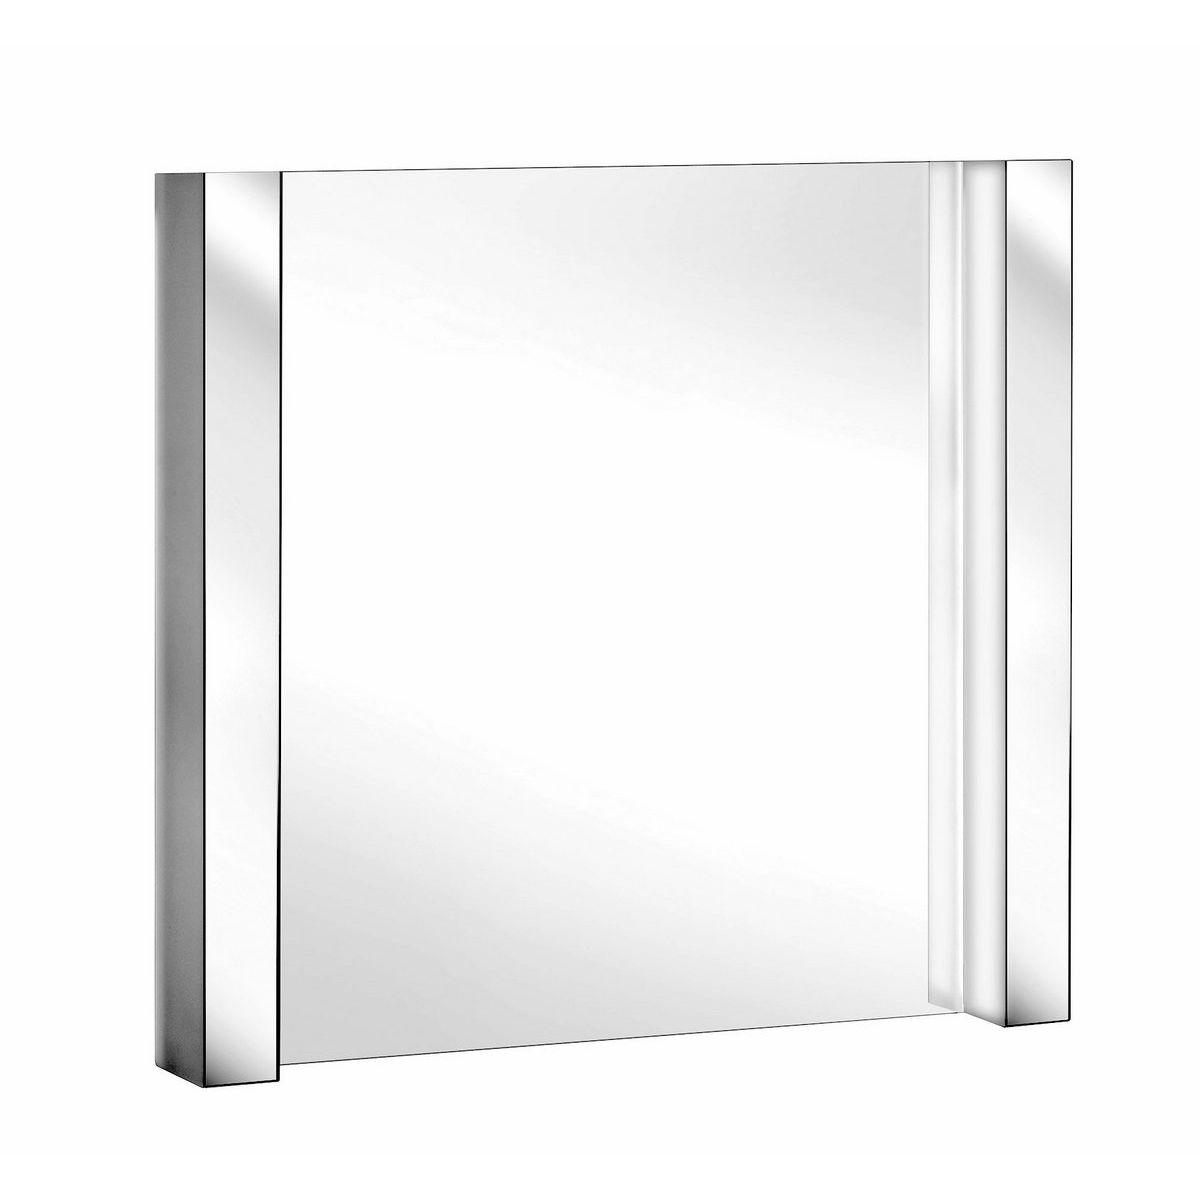 Keuco Elegance Illuminated Bathroom Mirror : UK Bathrooms